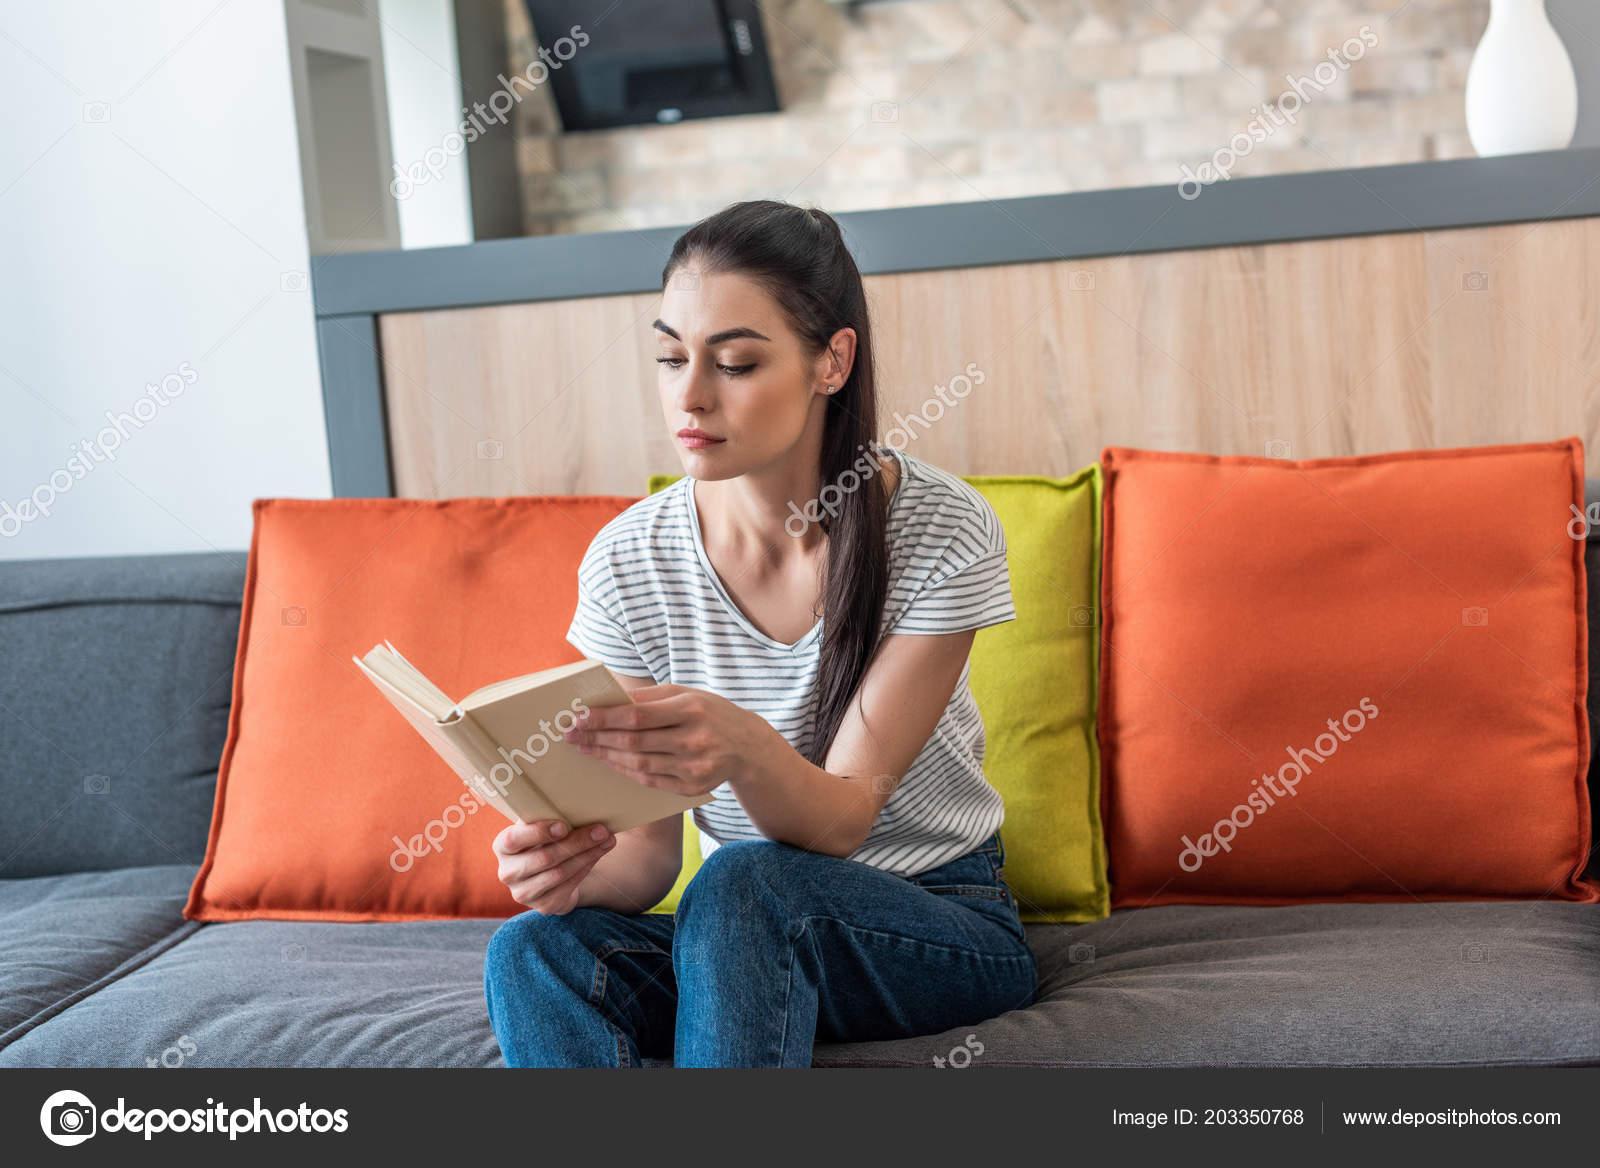 fe26fbb22cbd Portrait Attractive Woman Reading Book Couch Home — Stock Photo ...